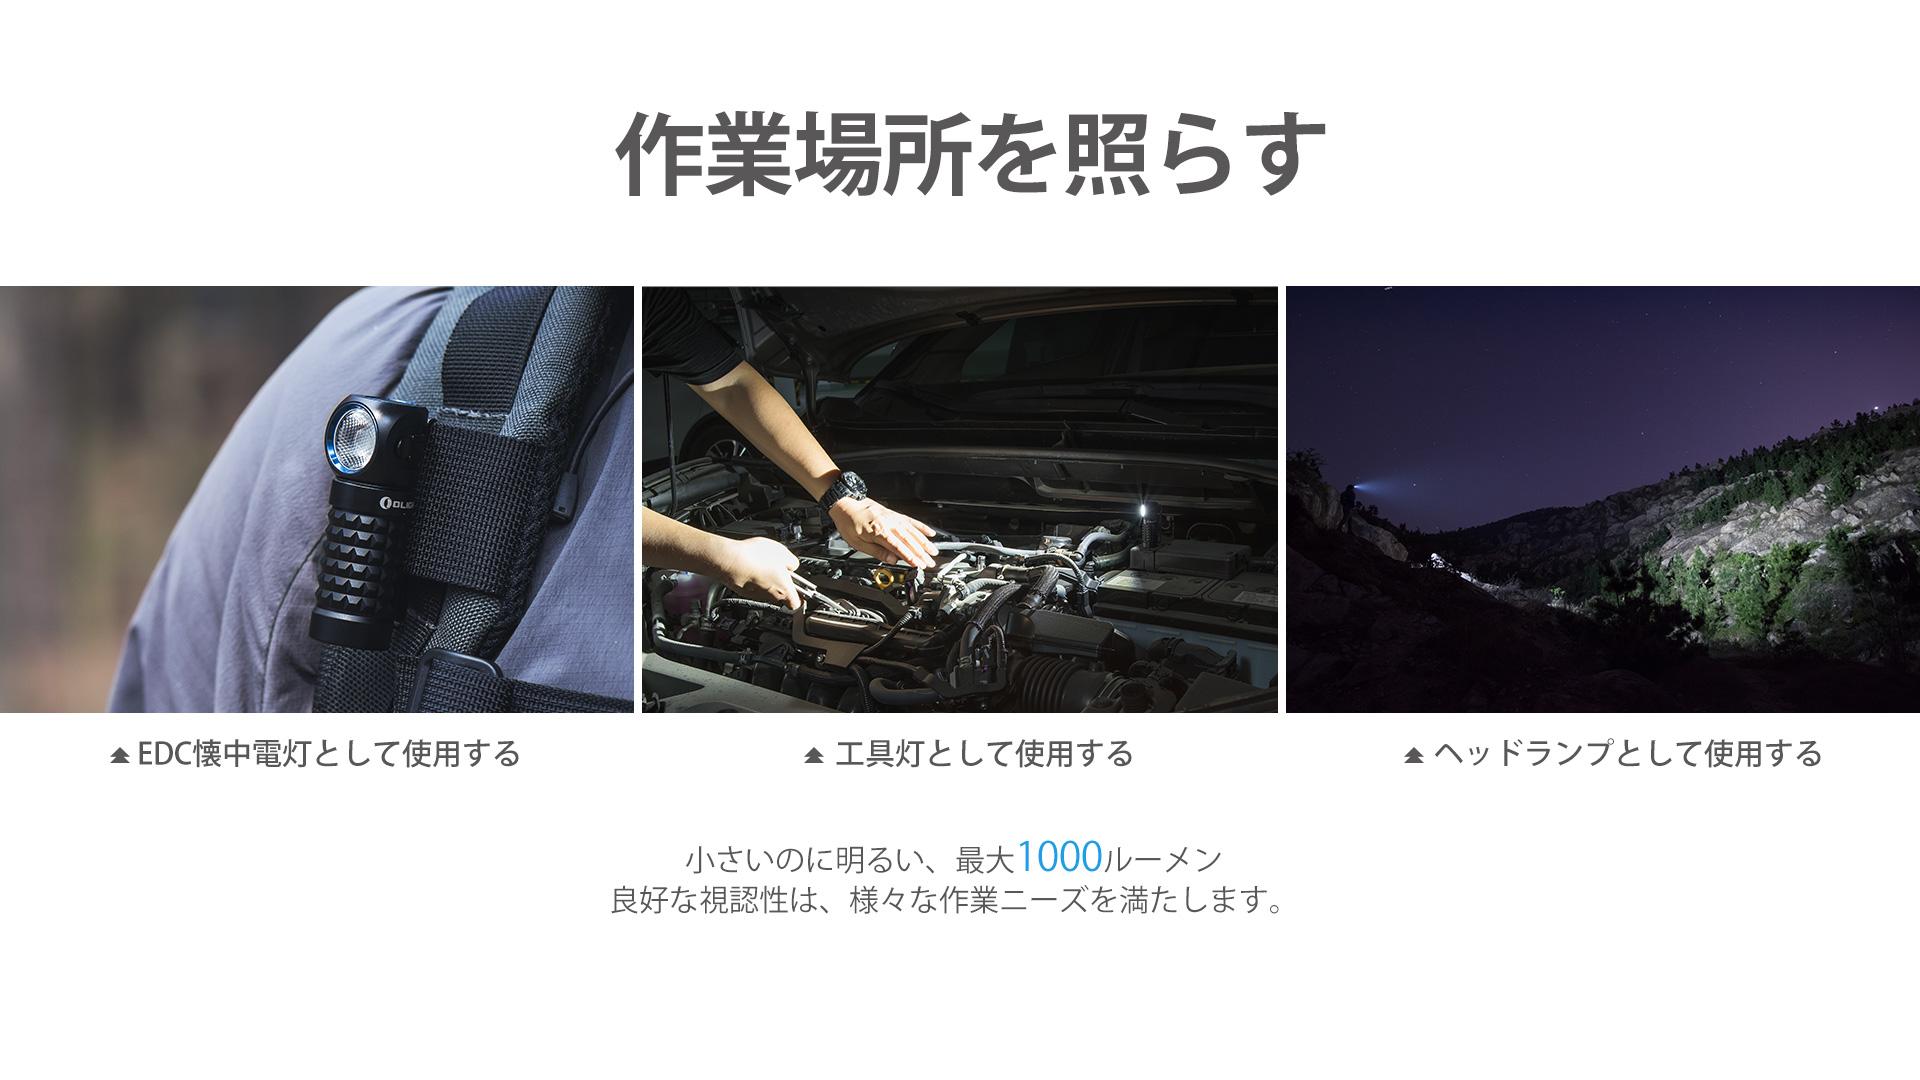 Perun Mini複数の場所、懐中電灯、作業灯、ワークライト、ヘッドライト、最大出力1000ルーメンで使用できます